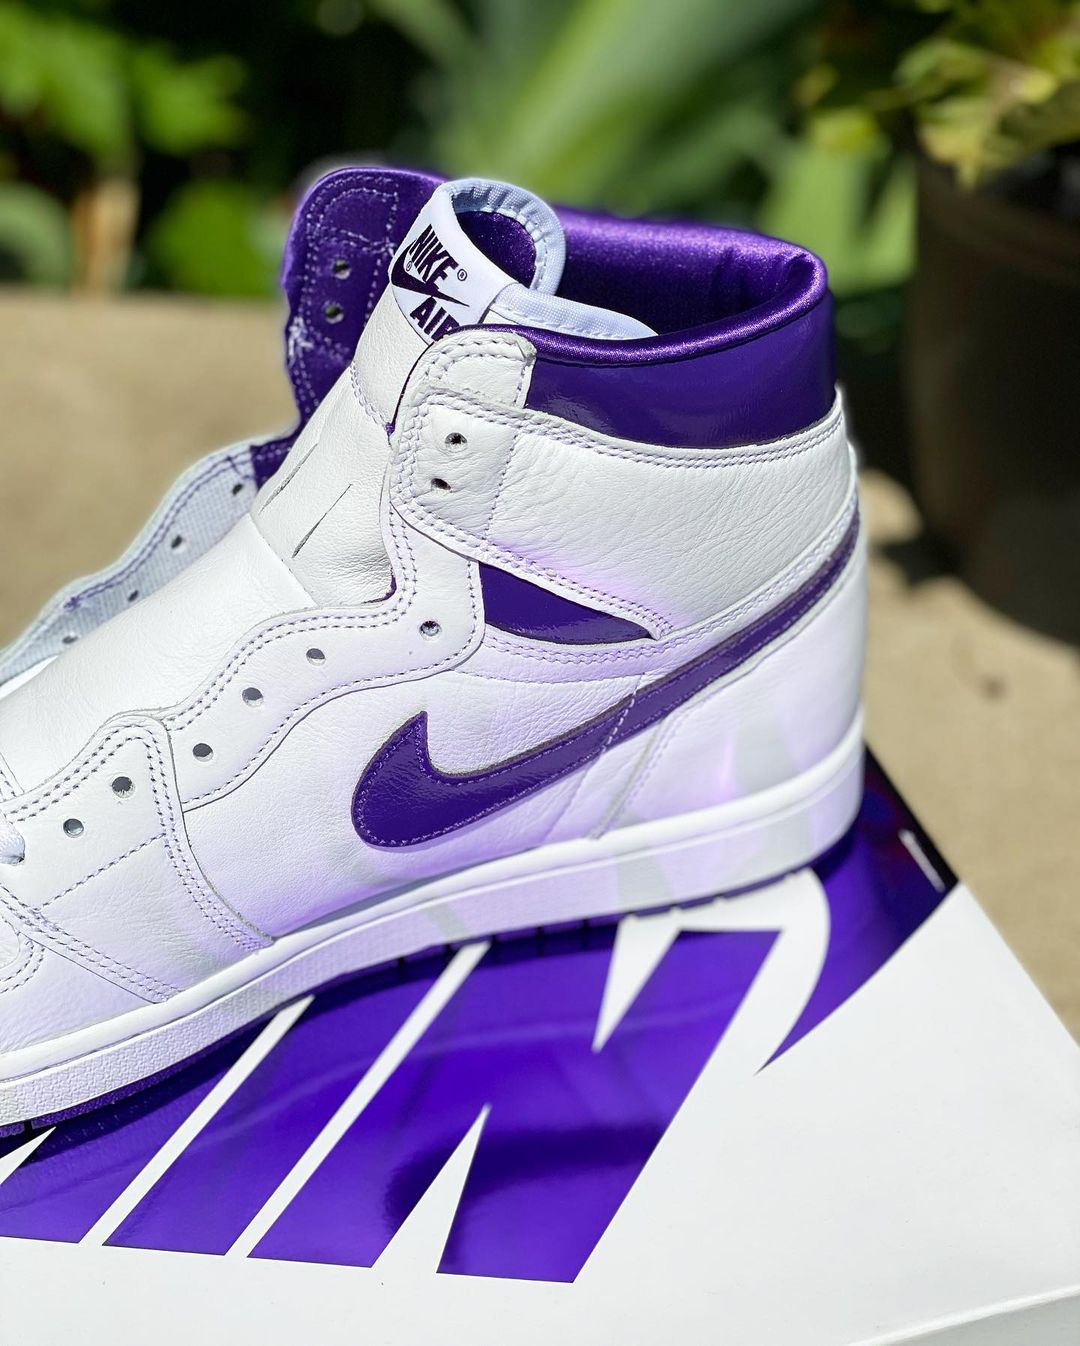 AJ1,AJ,Court Purple,CD0461-151  SNKRS 刚刚上架!元年「白紫」AJ1 最新实物曝光!